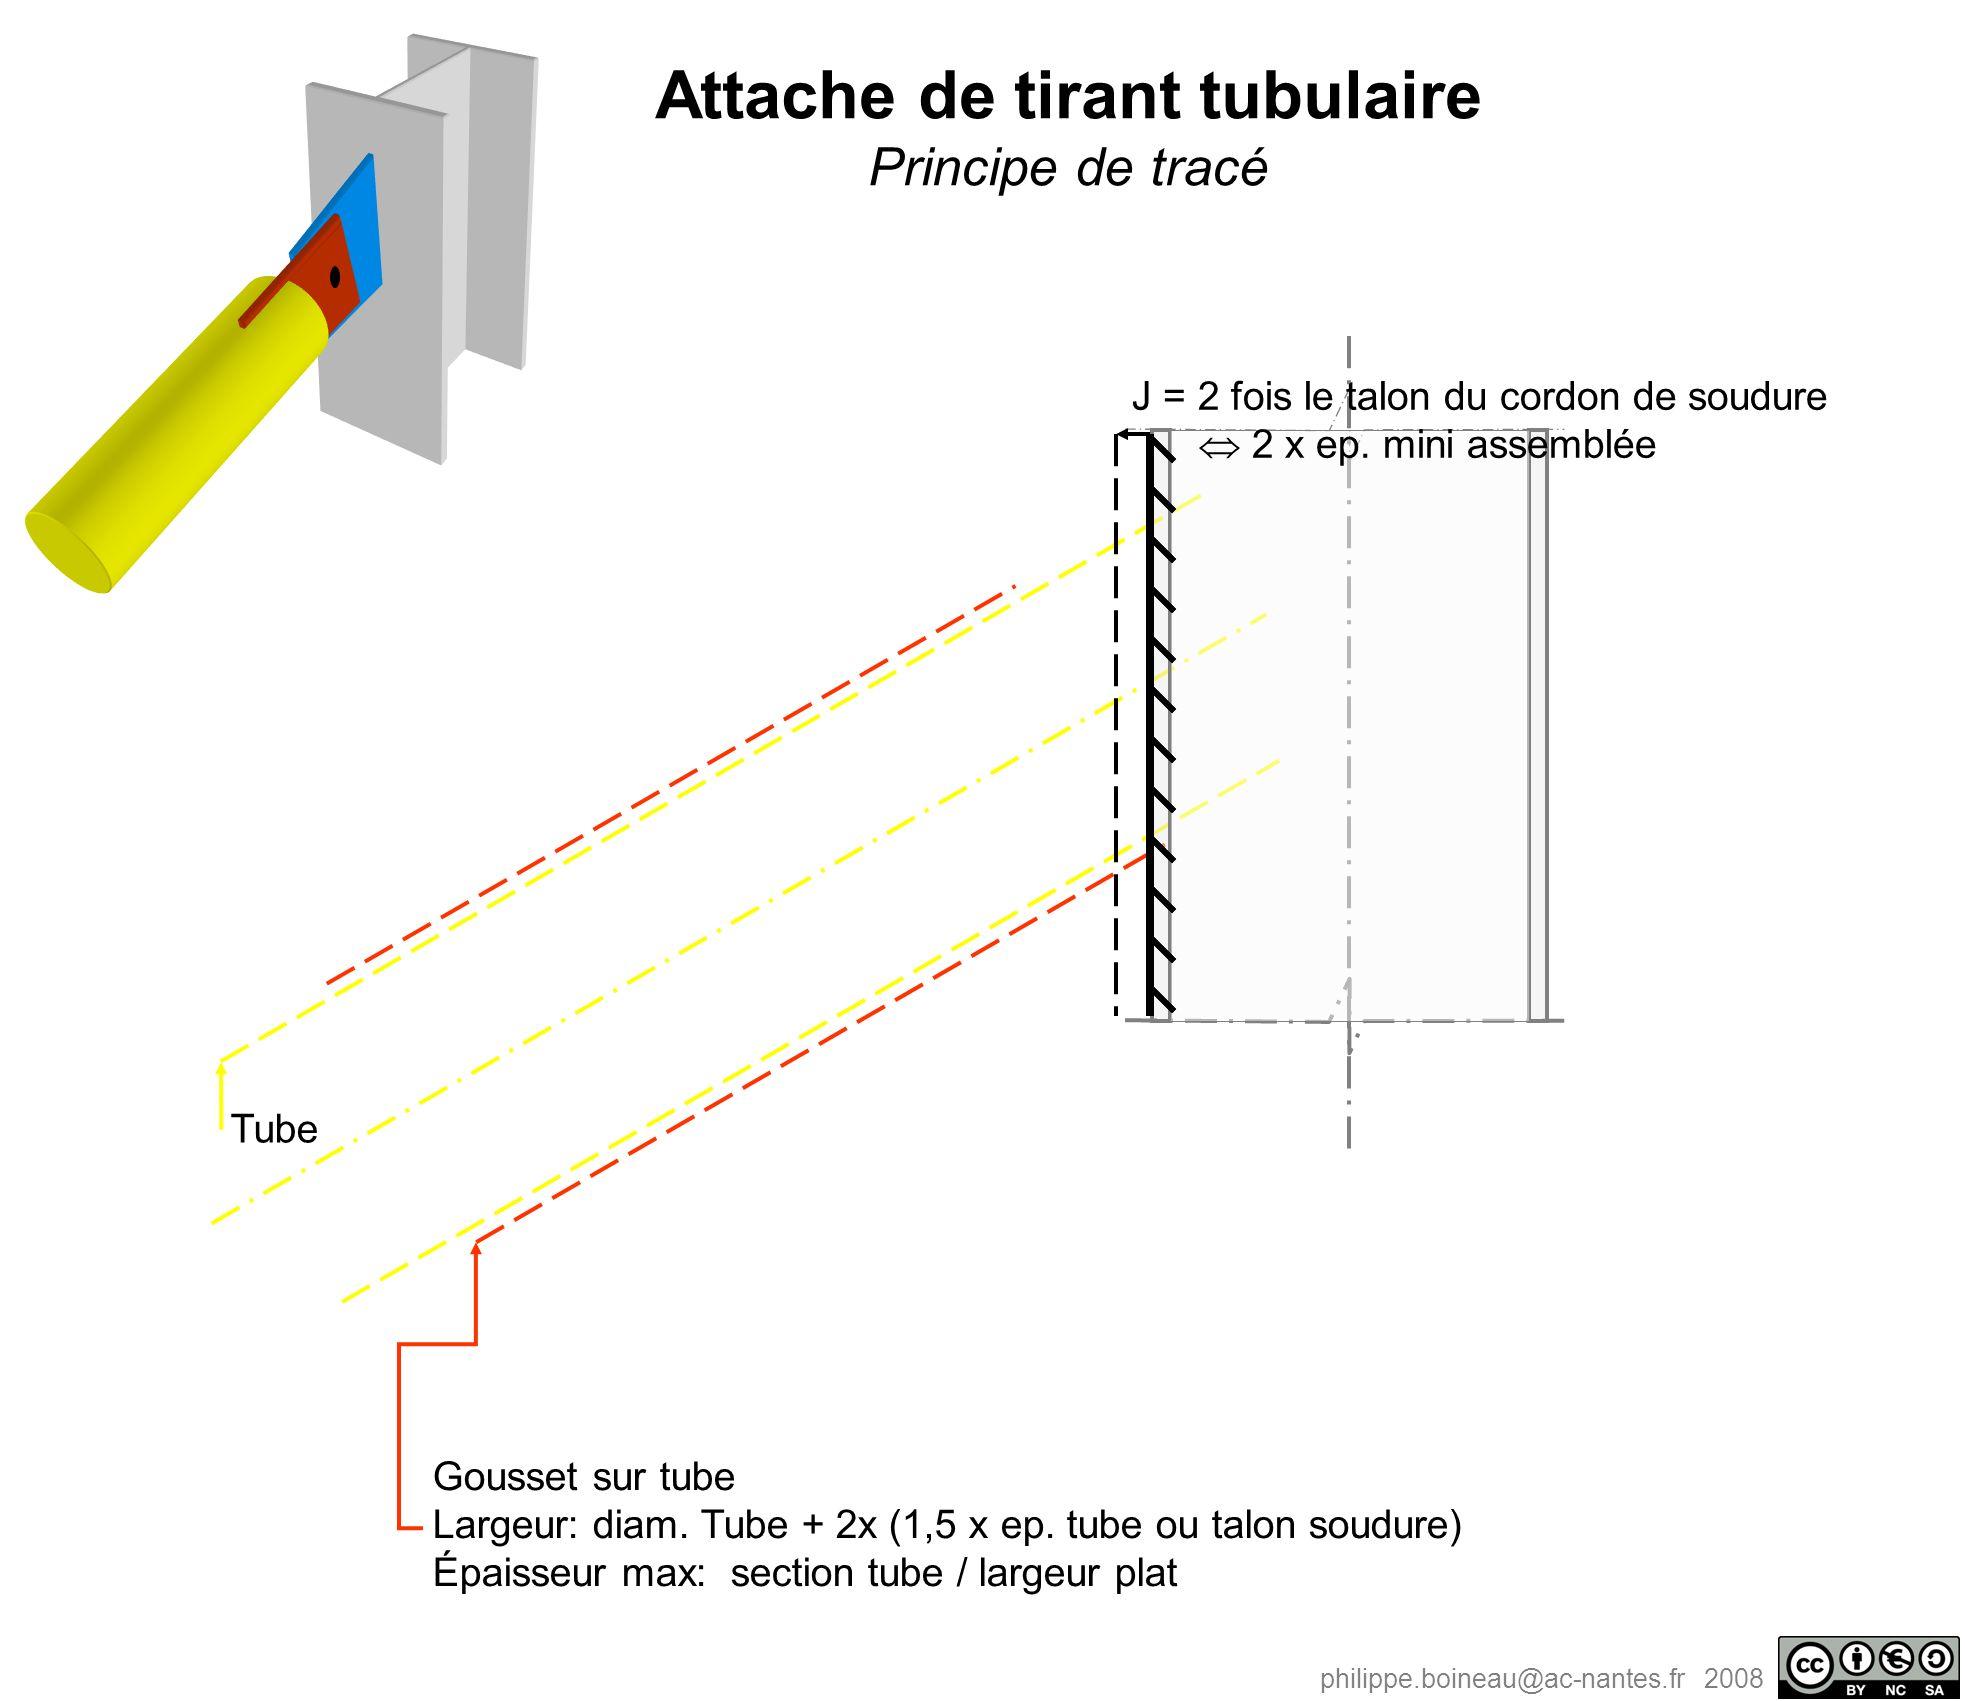 philippe.boineau@ac-nantes.fr 2008 Tube Gousset sur tube Largeur: diam. Tube + 2x (1,5 x ep. tube ou talon soudure) Épaisseur max: section tube / larg